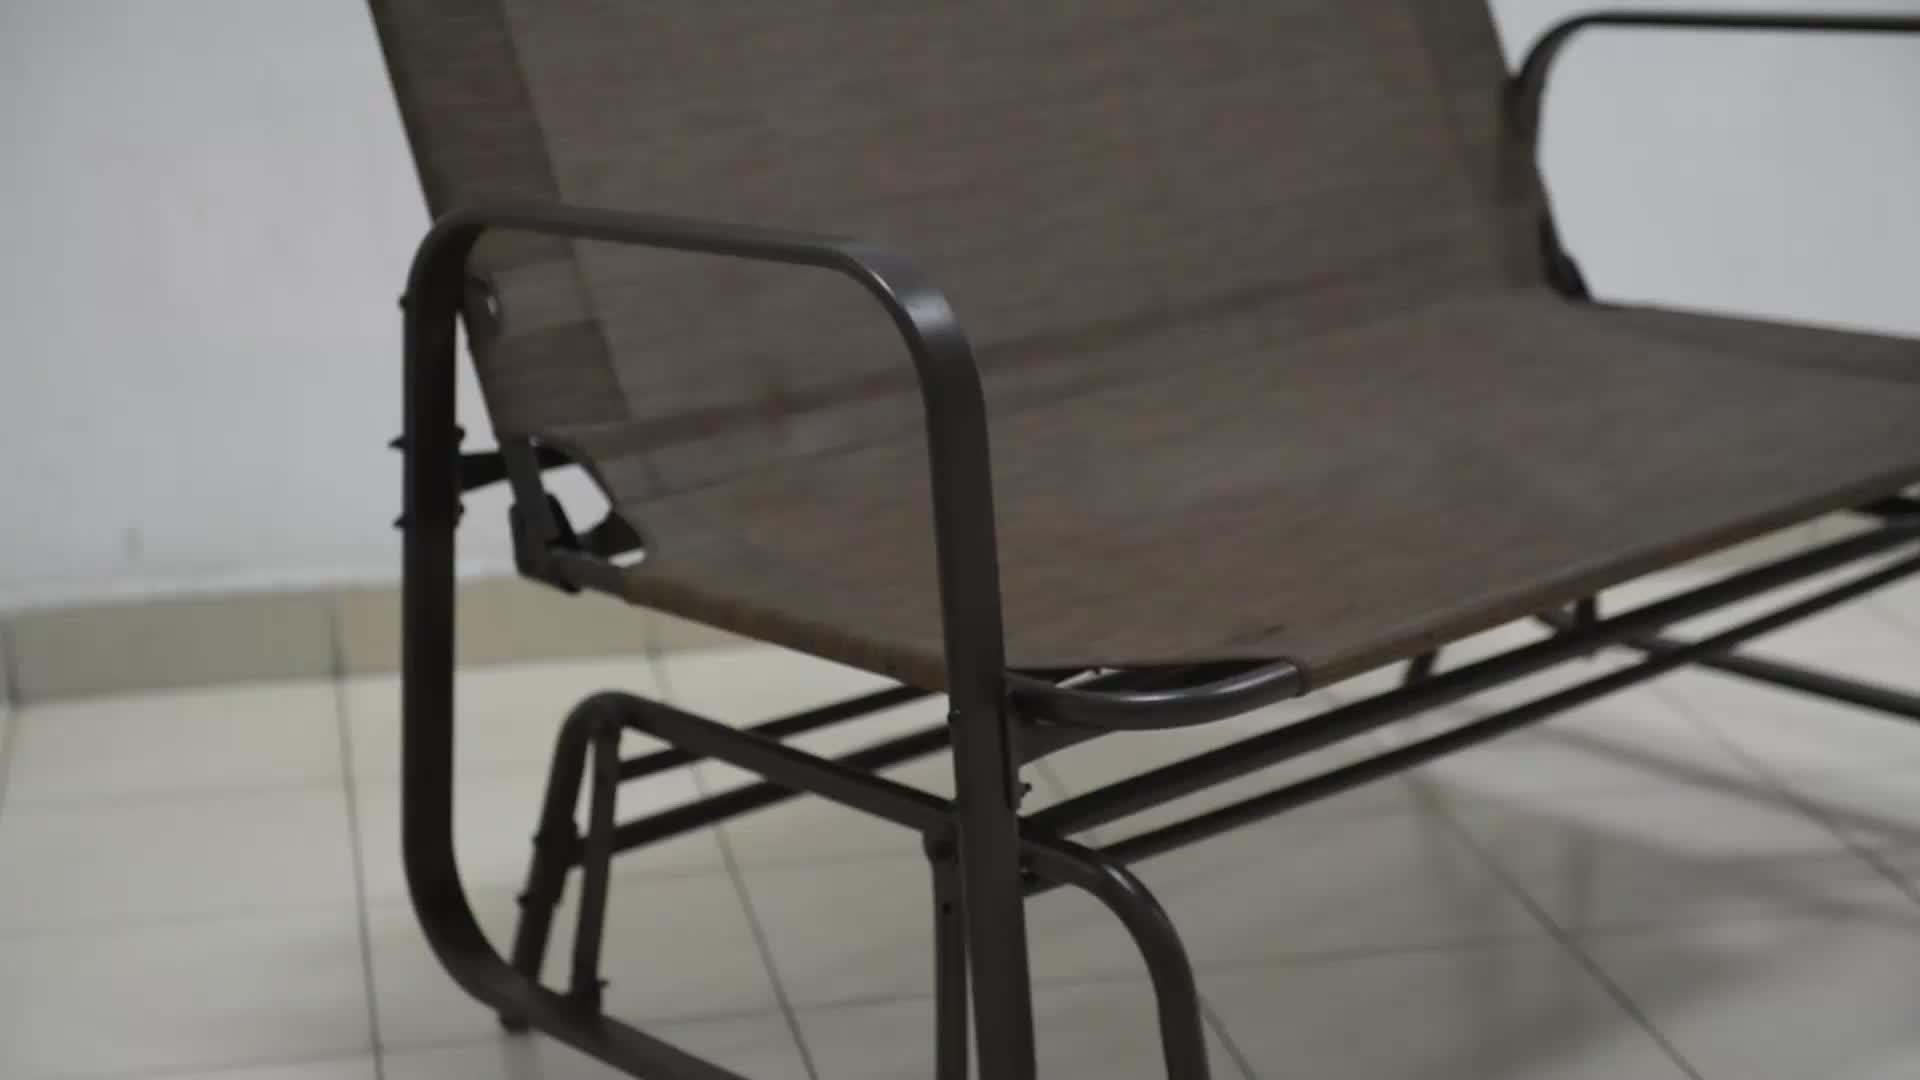 Outdoor Garden Steel Frame Patio Swing Glider Loveseat Bench Rocking Chair – Buy Outdoor Garden Bench,metal Garden Bench,glider Rocking Chair Product For Black Steel Patio Swing Glider Benches Powder Coated (View 20 of 25)